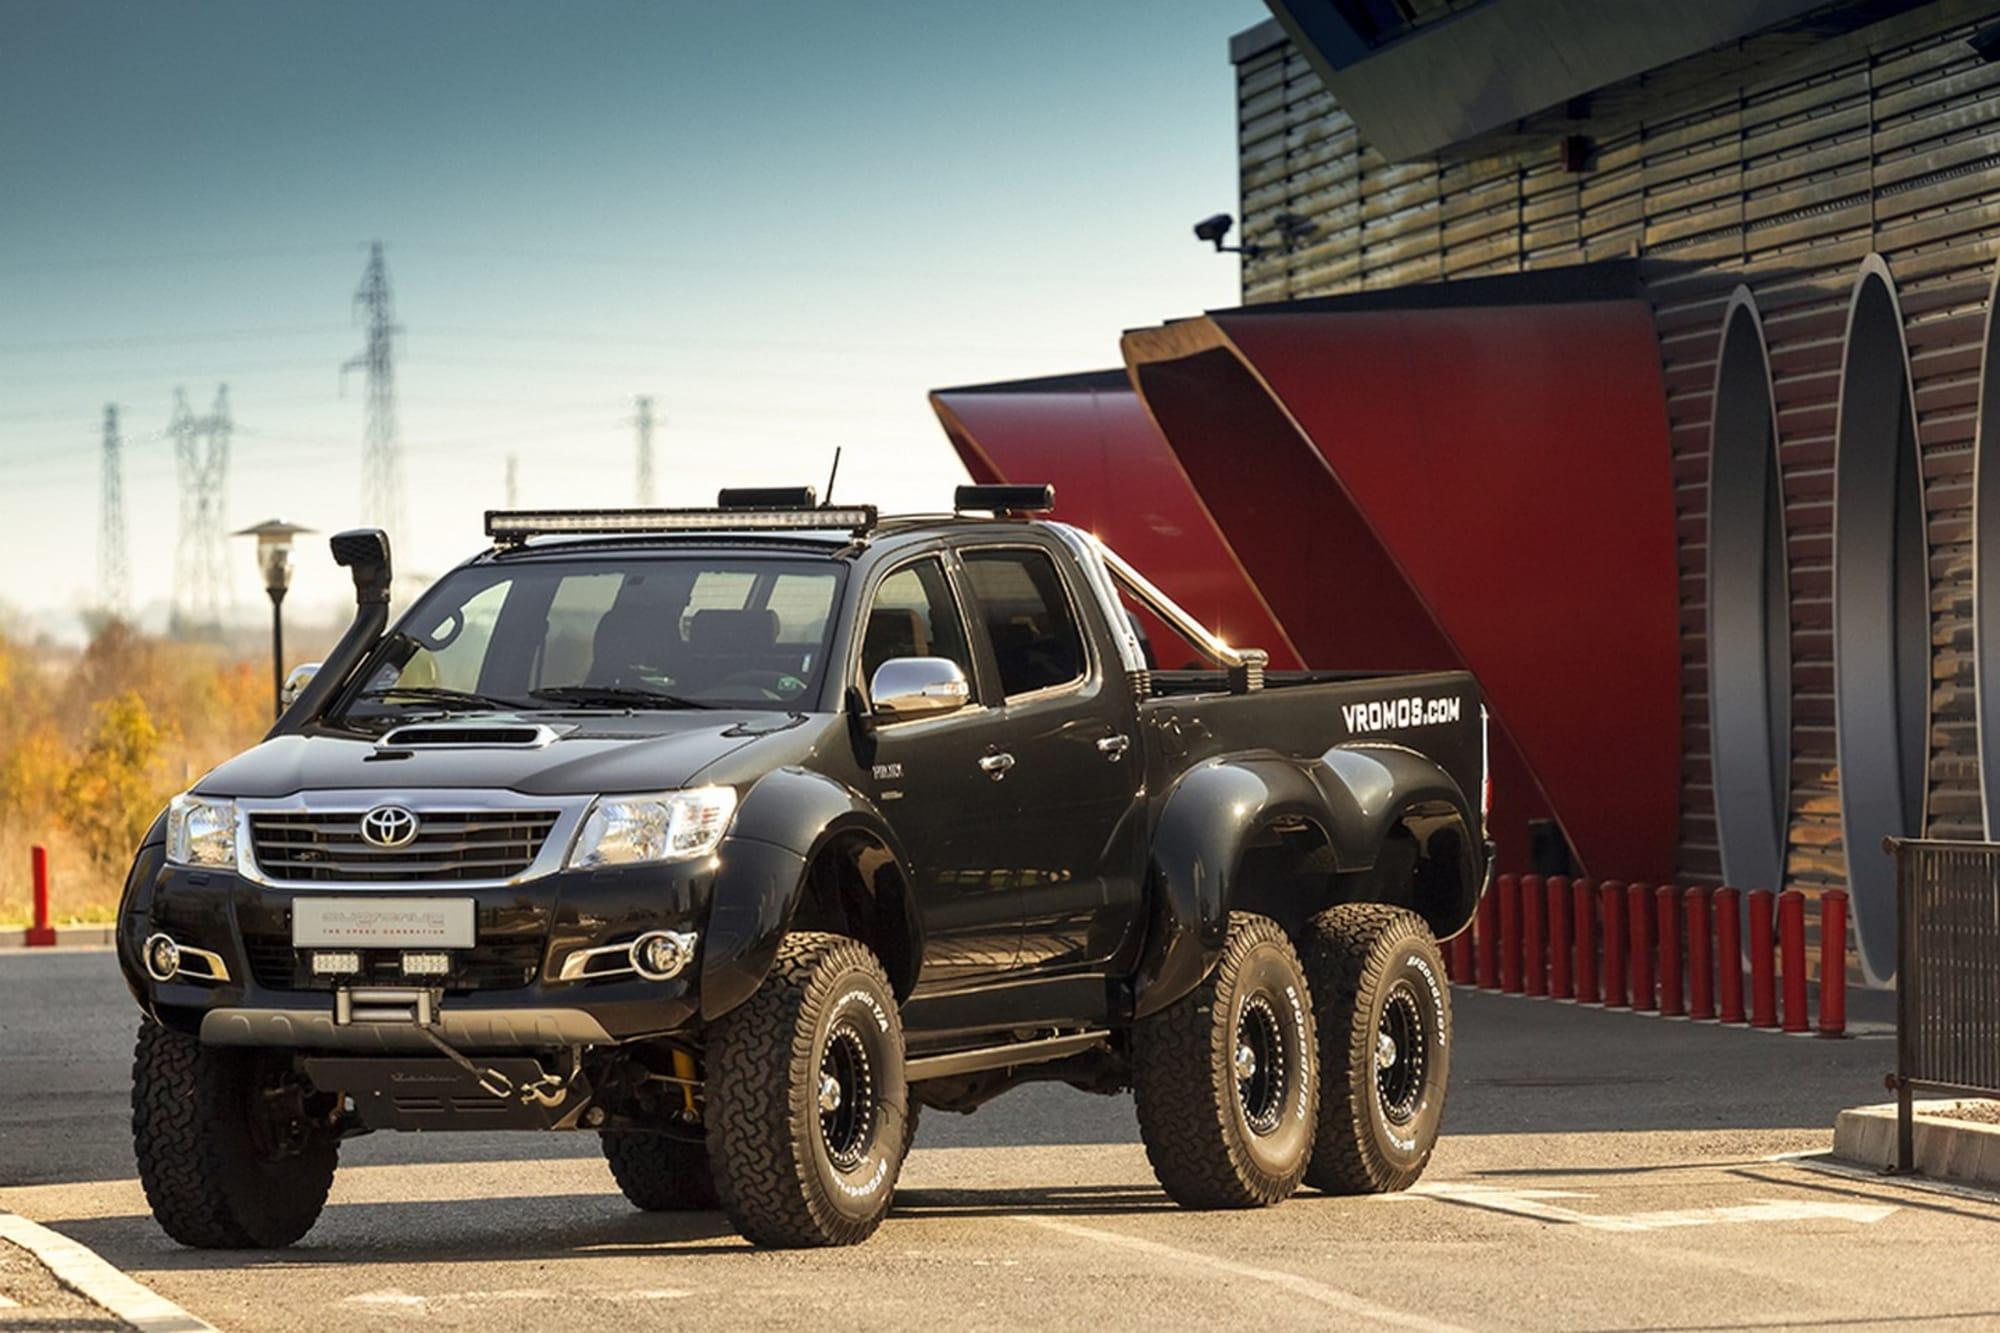 Kekurangan Toyota 6X6 Harga